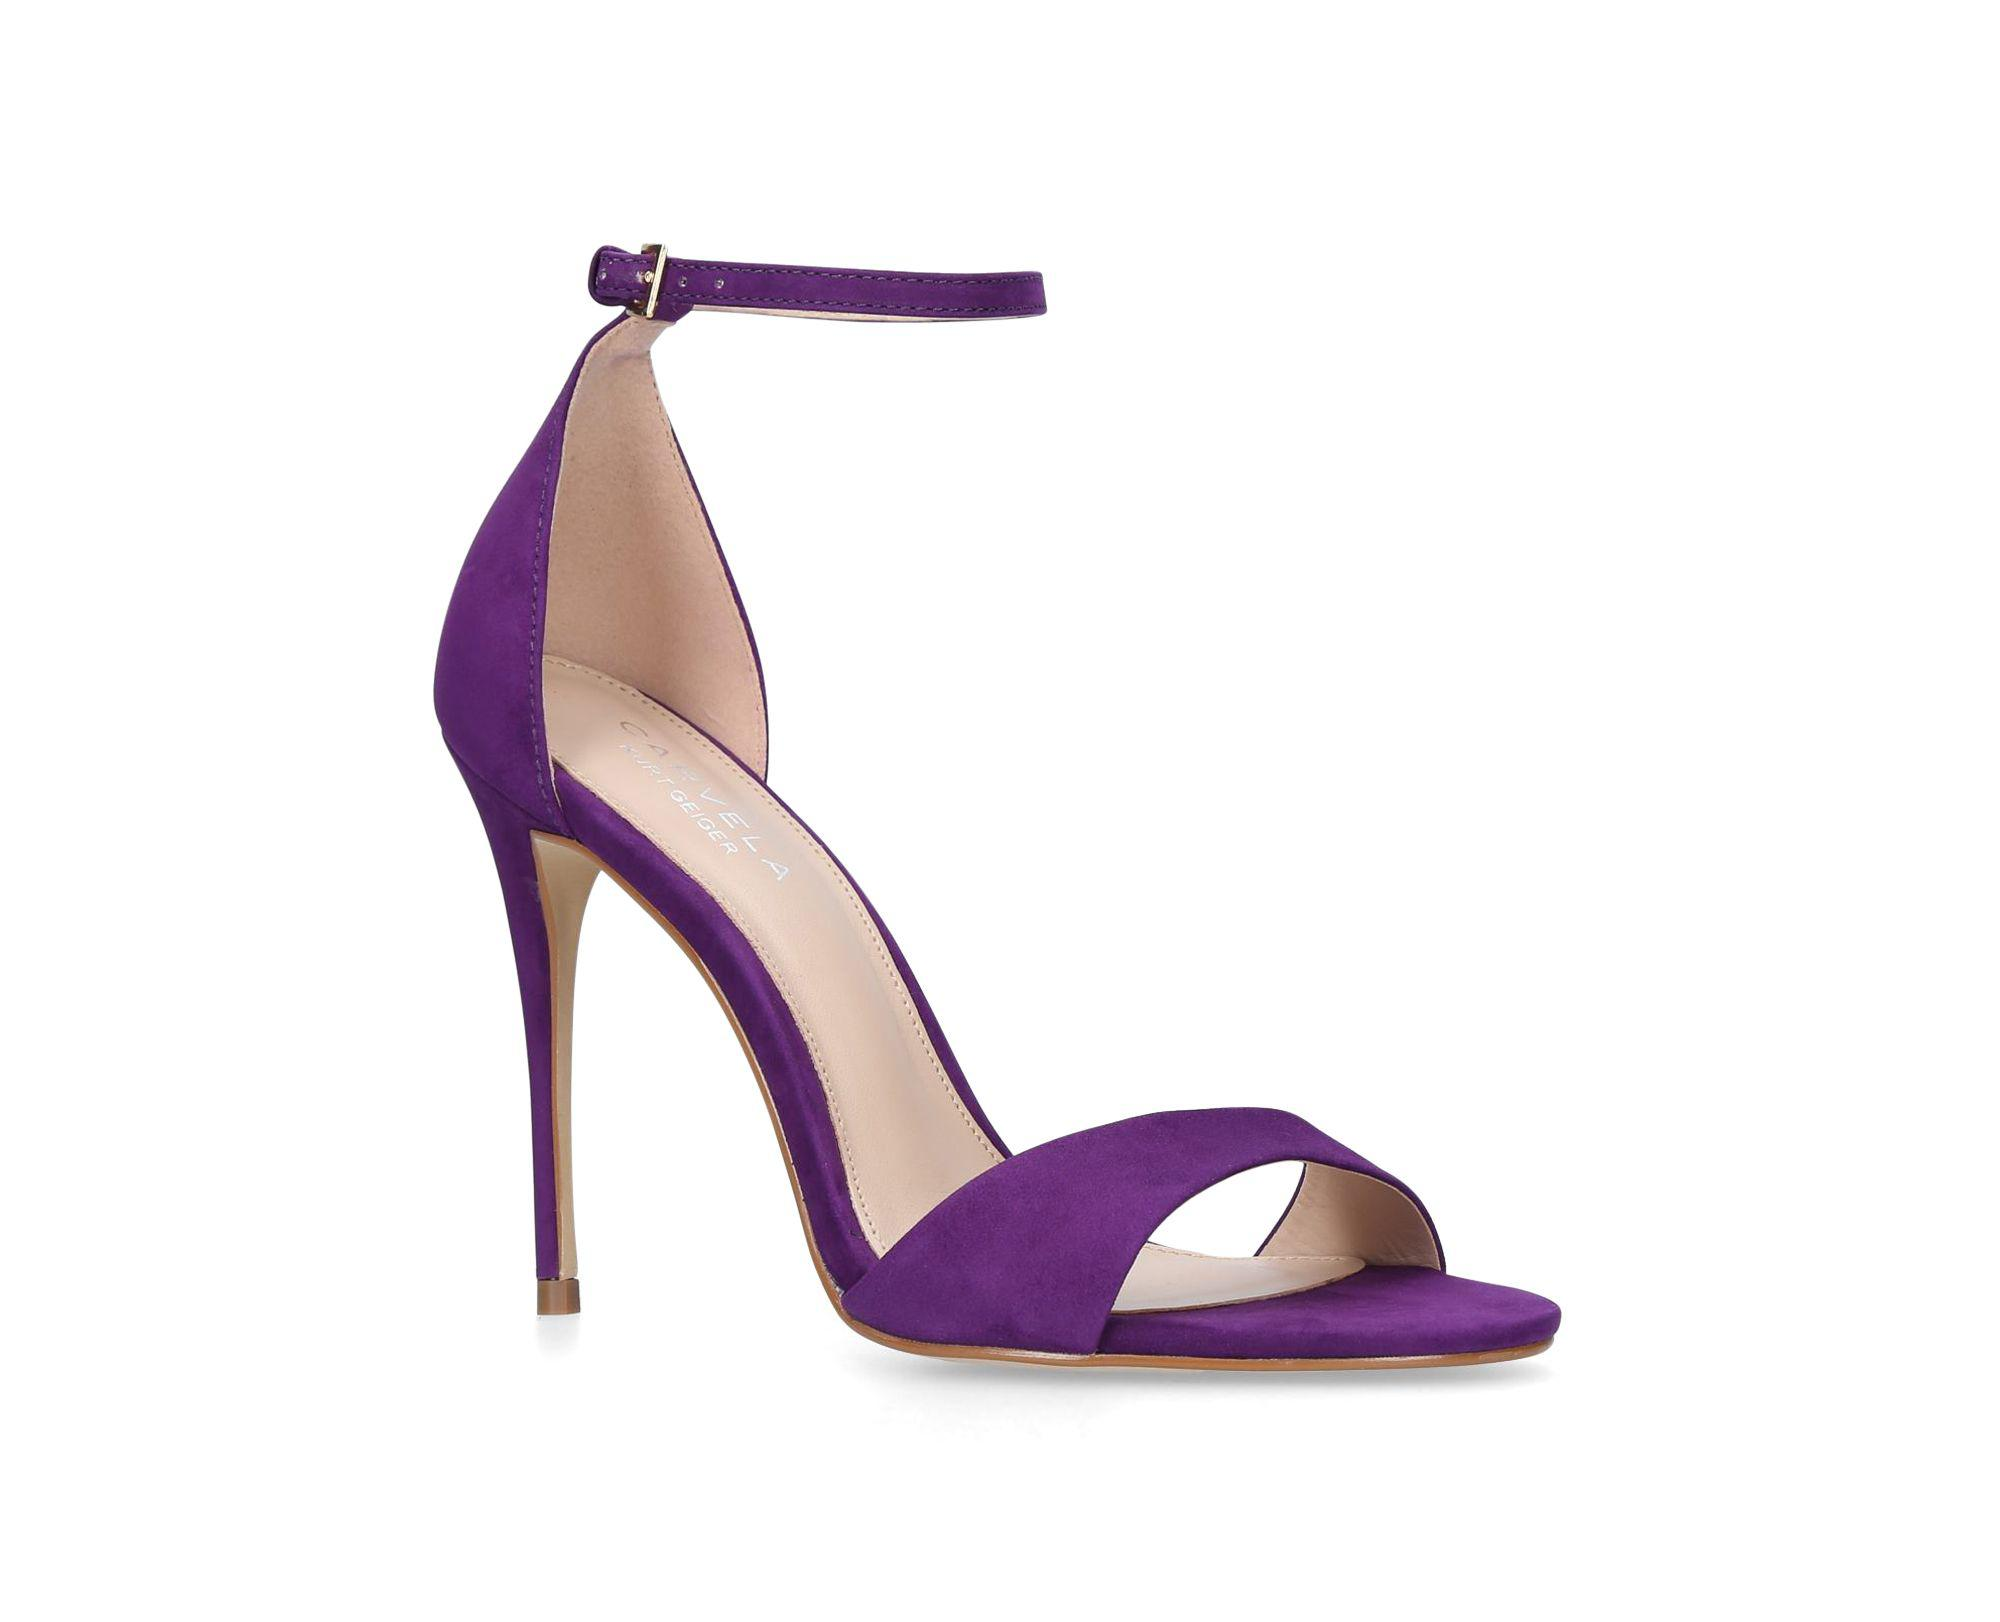 6464b139ce20 Carvela Kurt Geiger Purple  glimmer  High Heel Sandals in Purple - Lyst